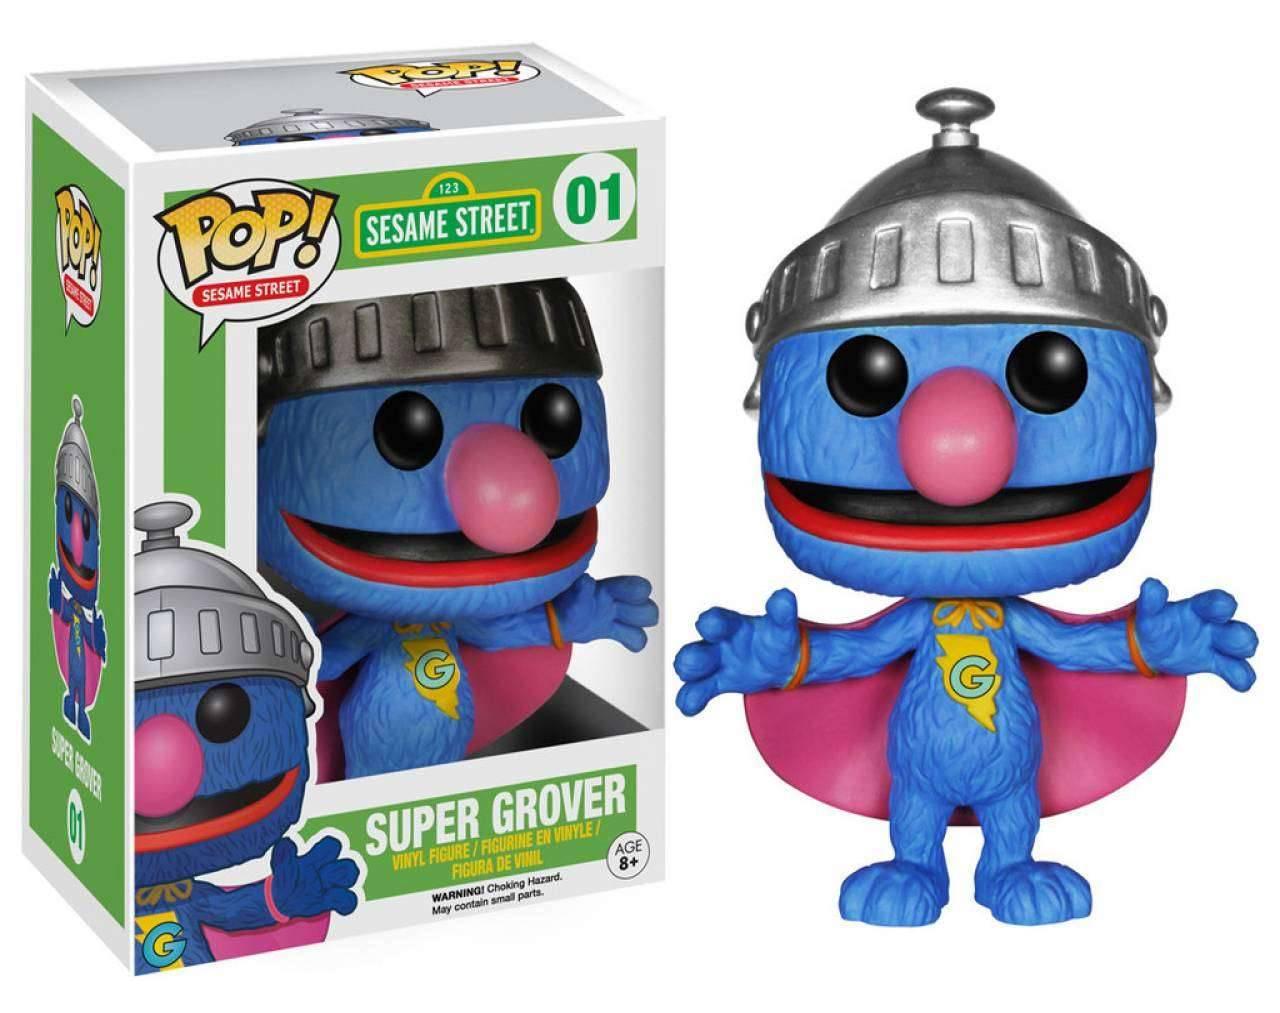 Super Grover Pop! Vinyl